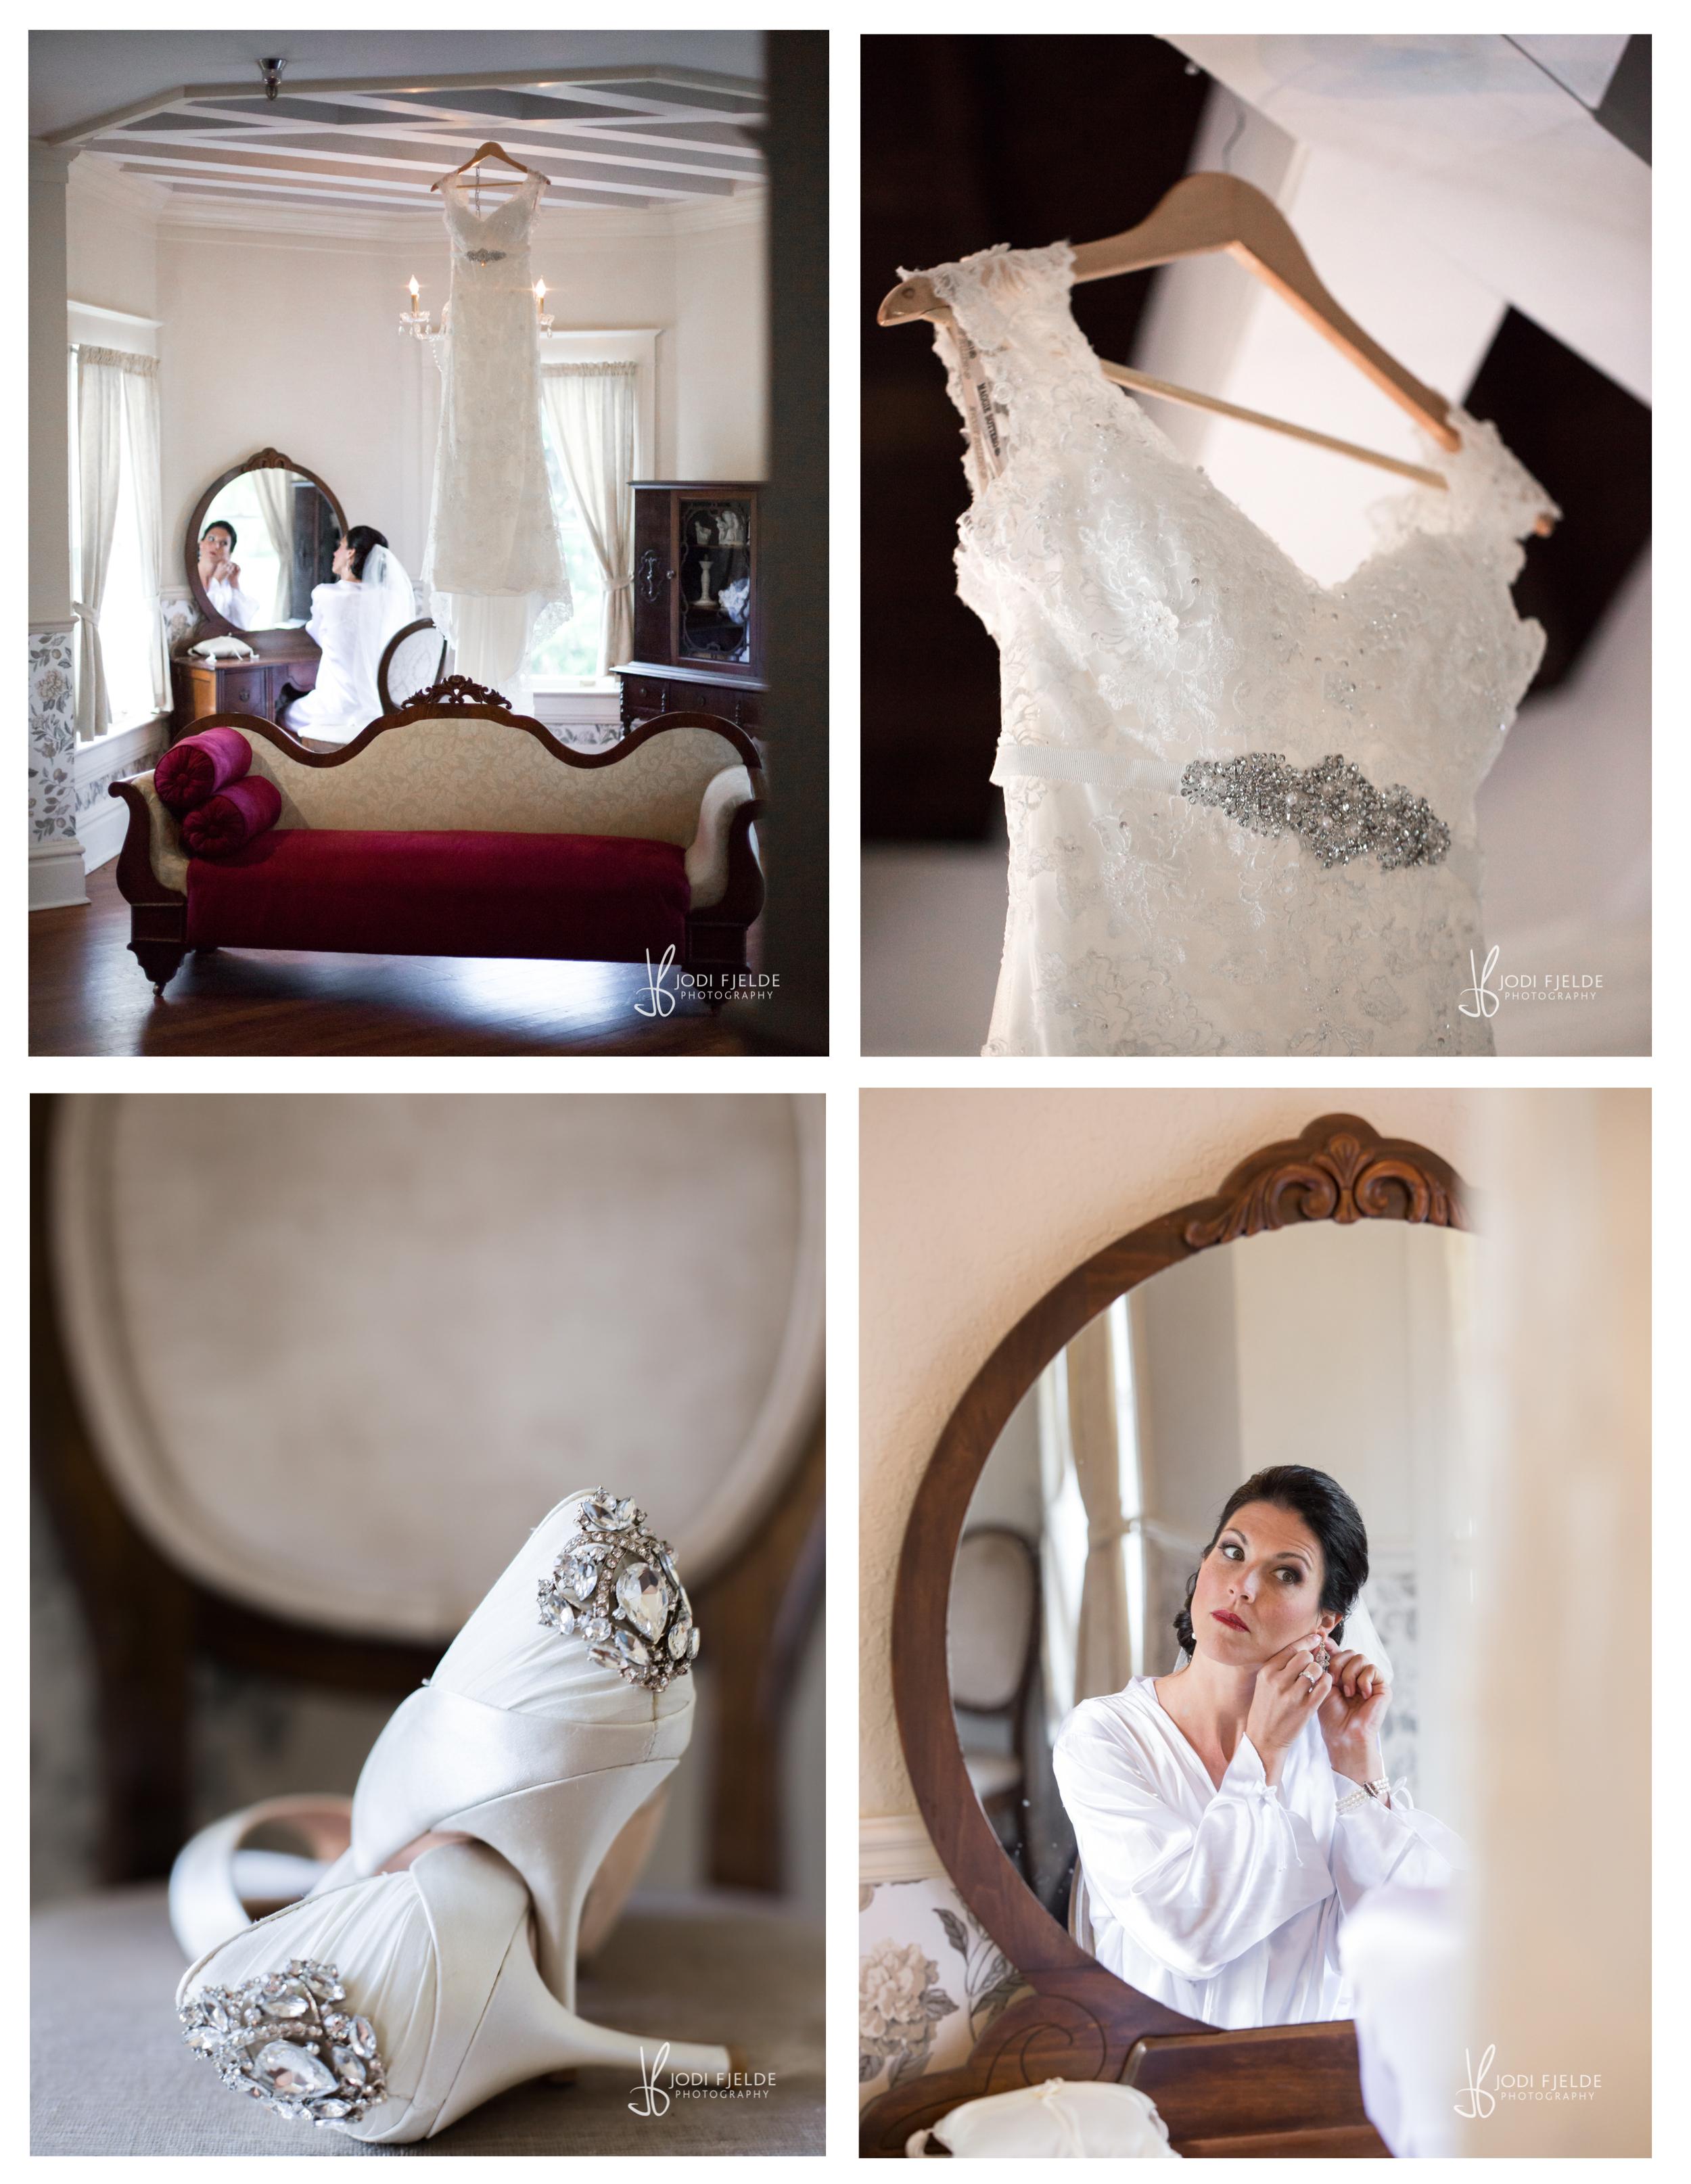 Highland_Manor_Apopka_Florida_wedding_Jackie_&_Tim_photography_jodi_Fjelde_photography-1.jpg